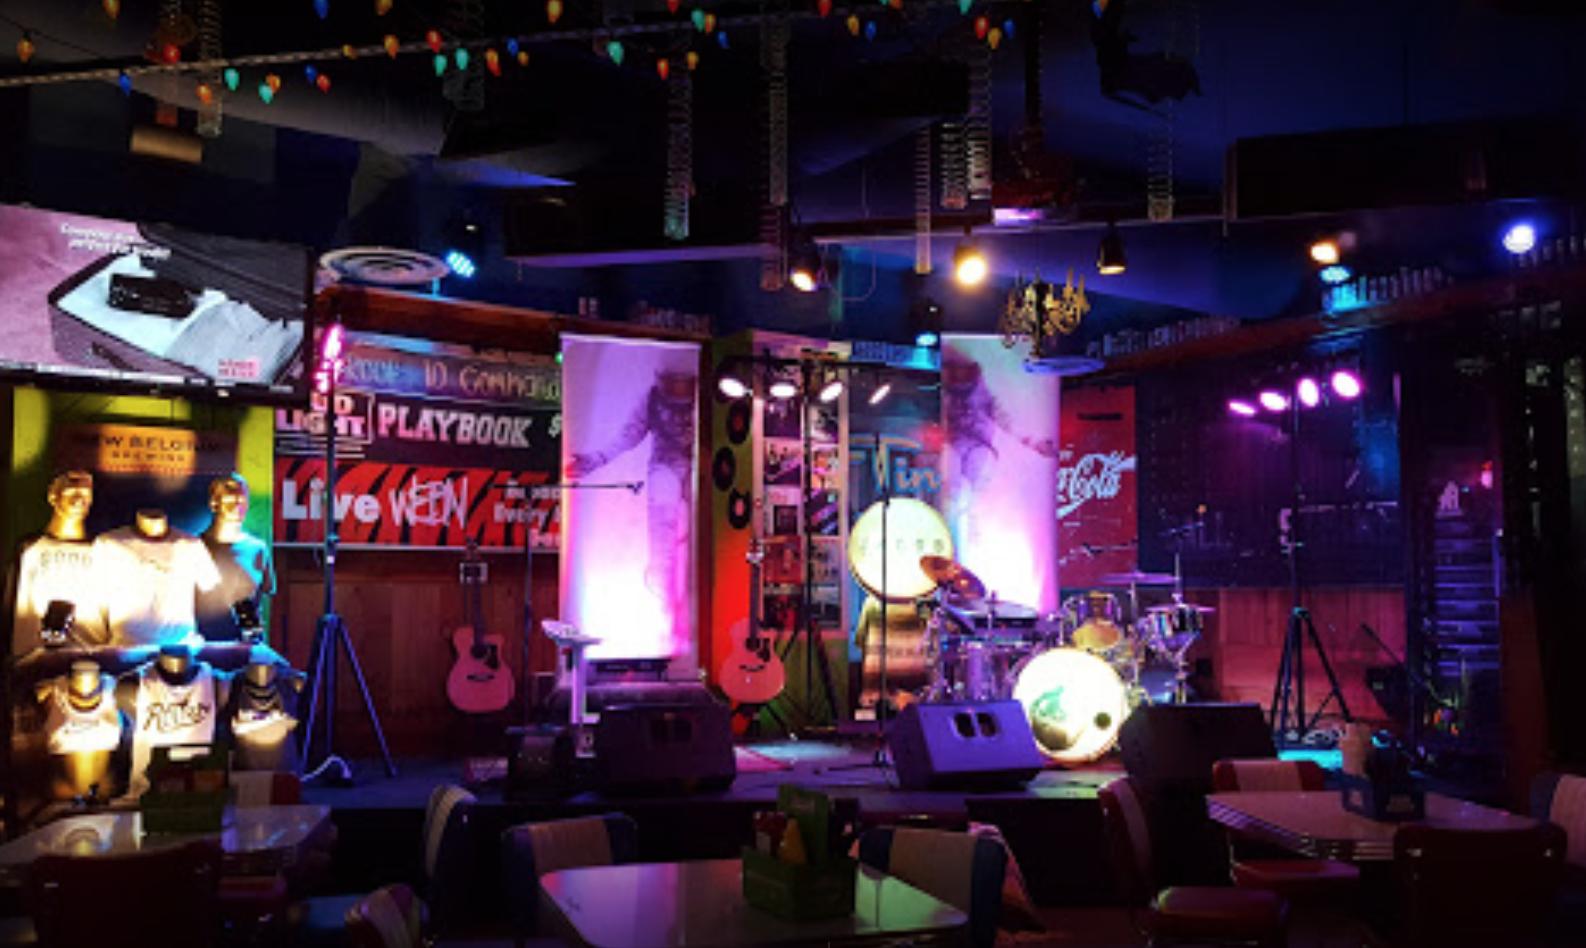 Night lit bar with pop culture feel